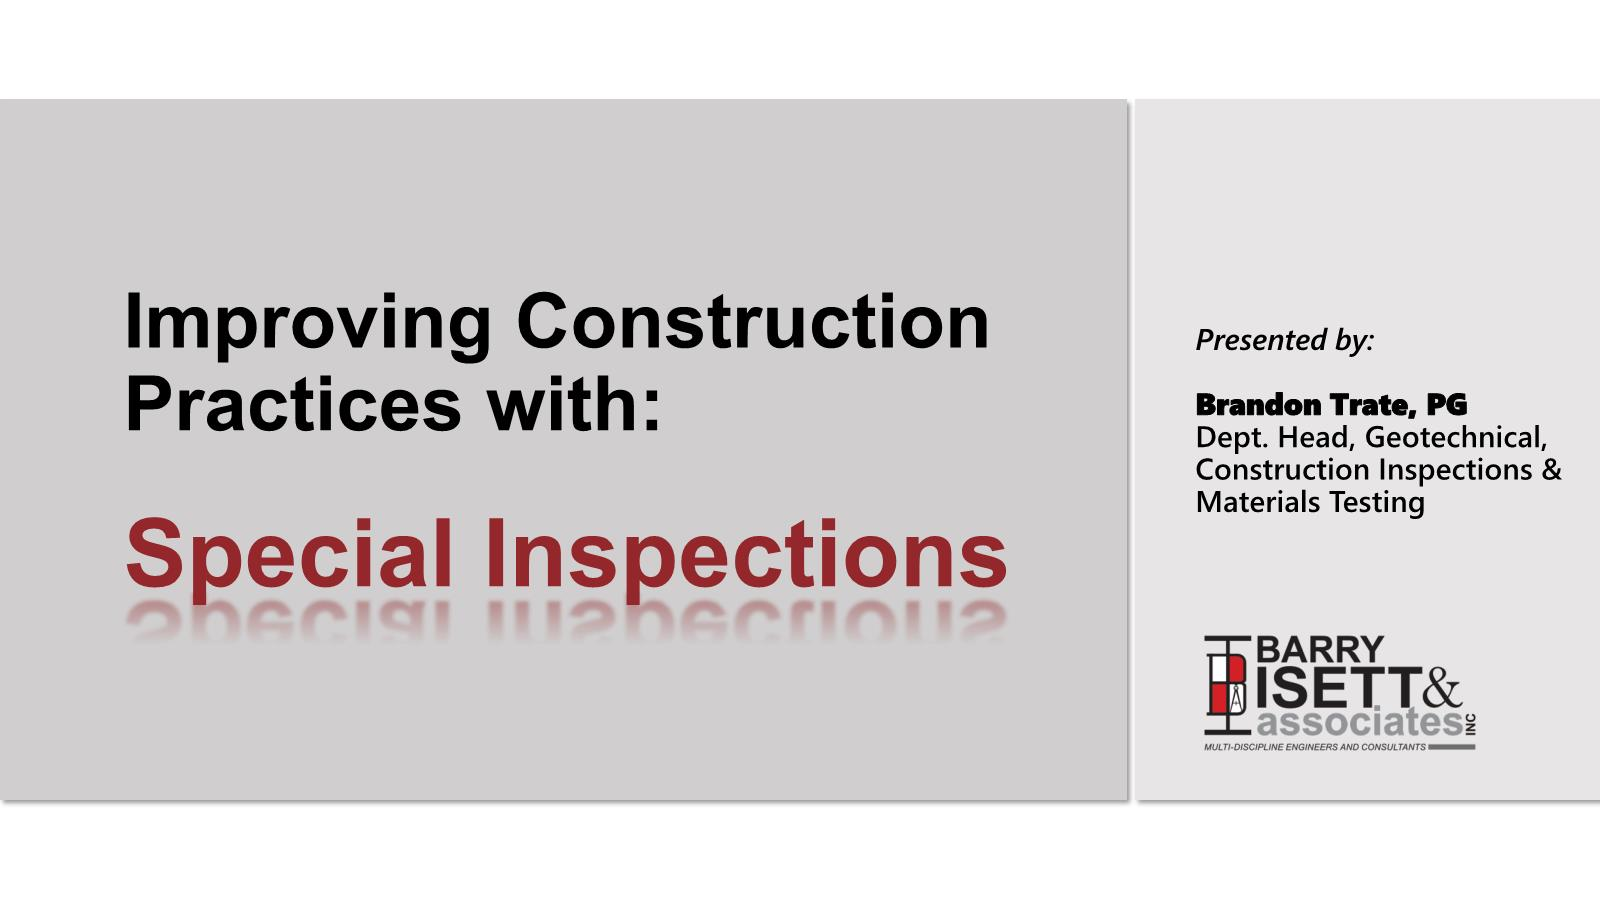 Barry Isett & Associates - Geotechnical, Construction